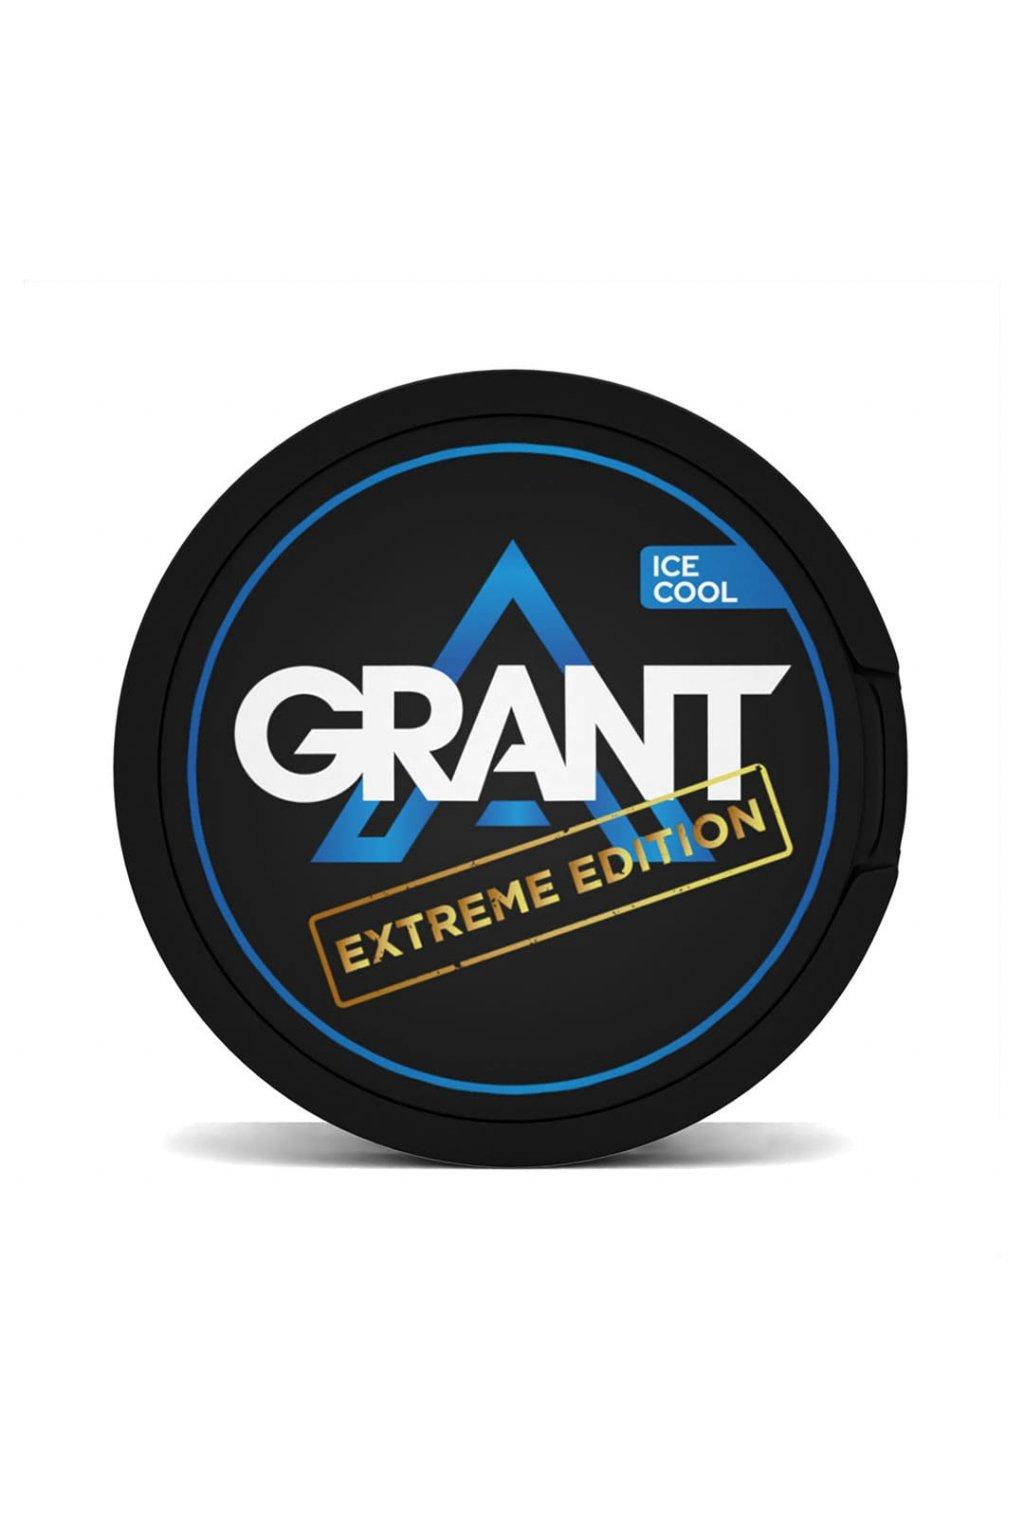 grant ice cool 35 mg g 740x min